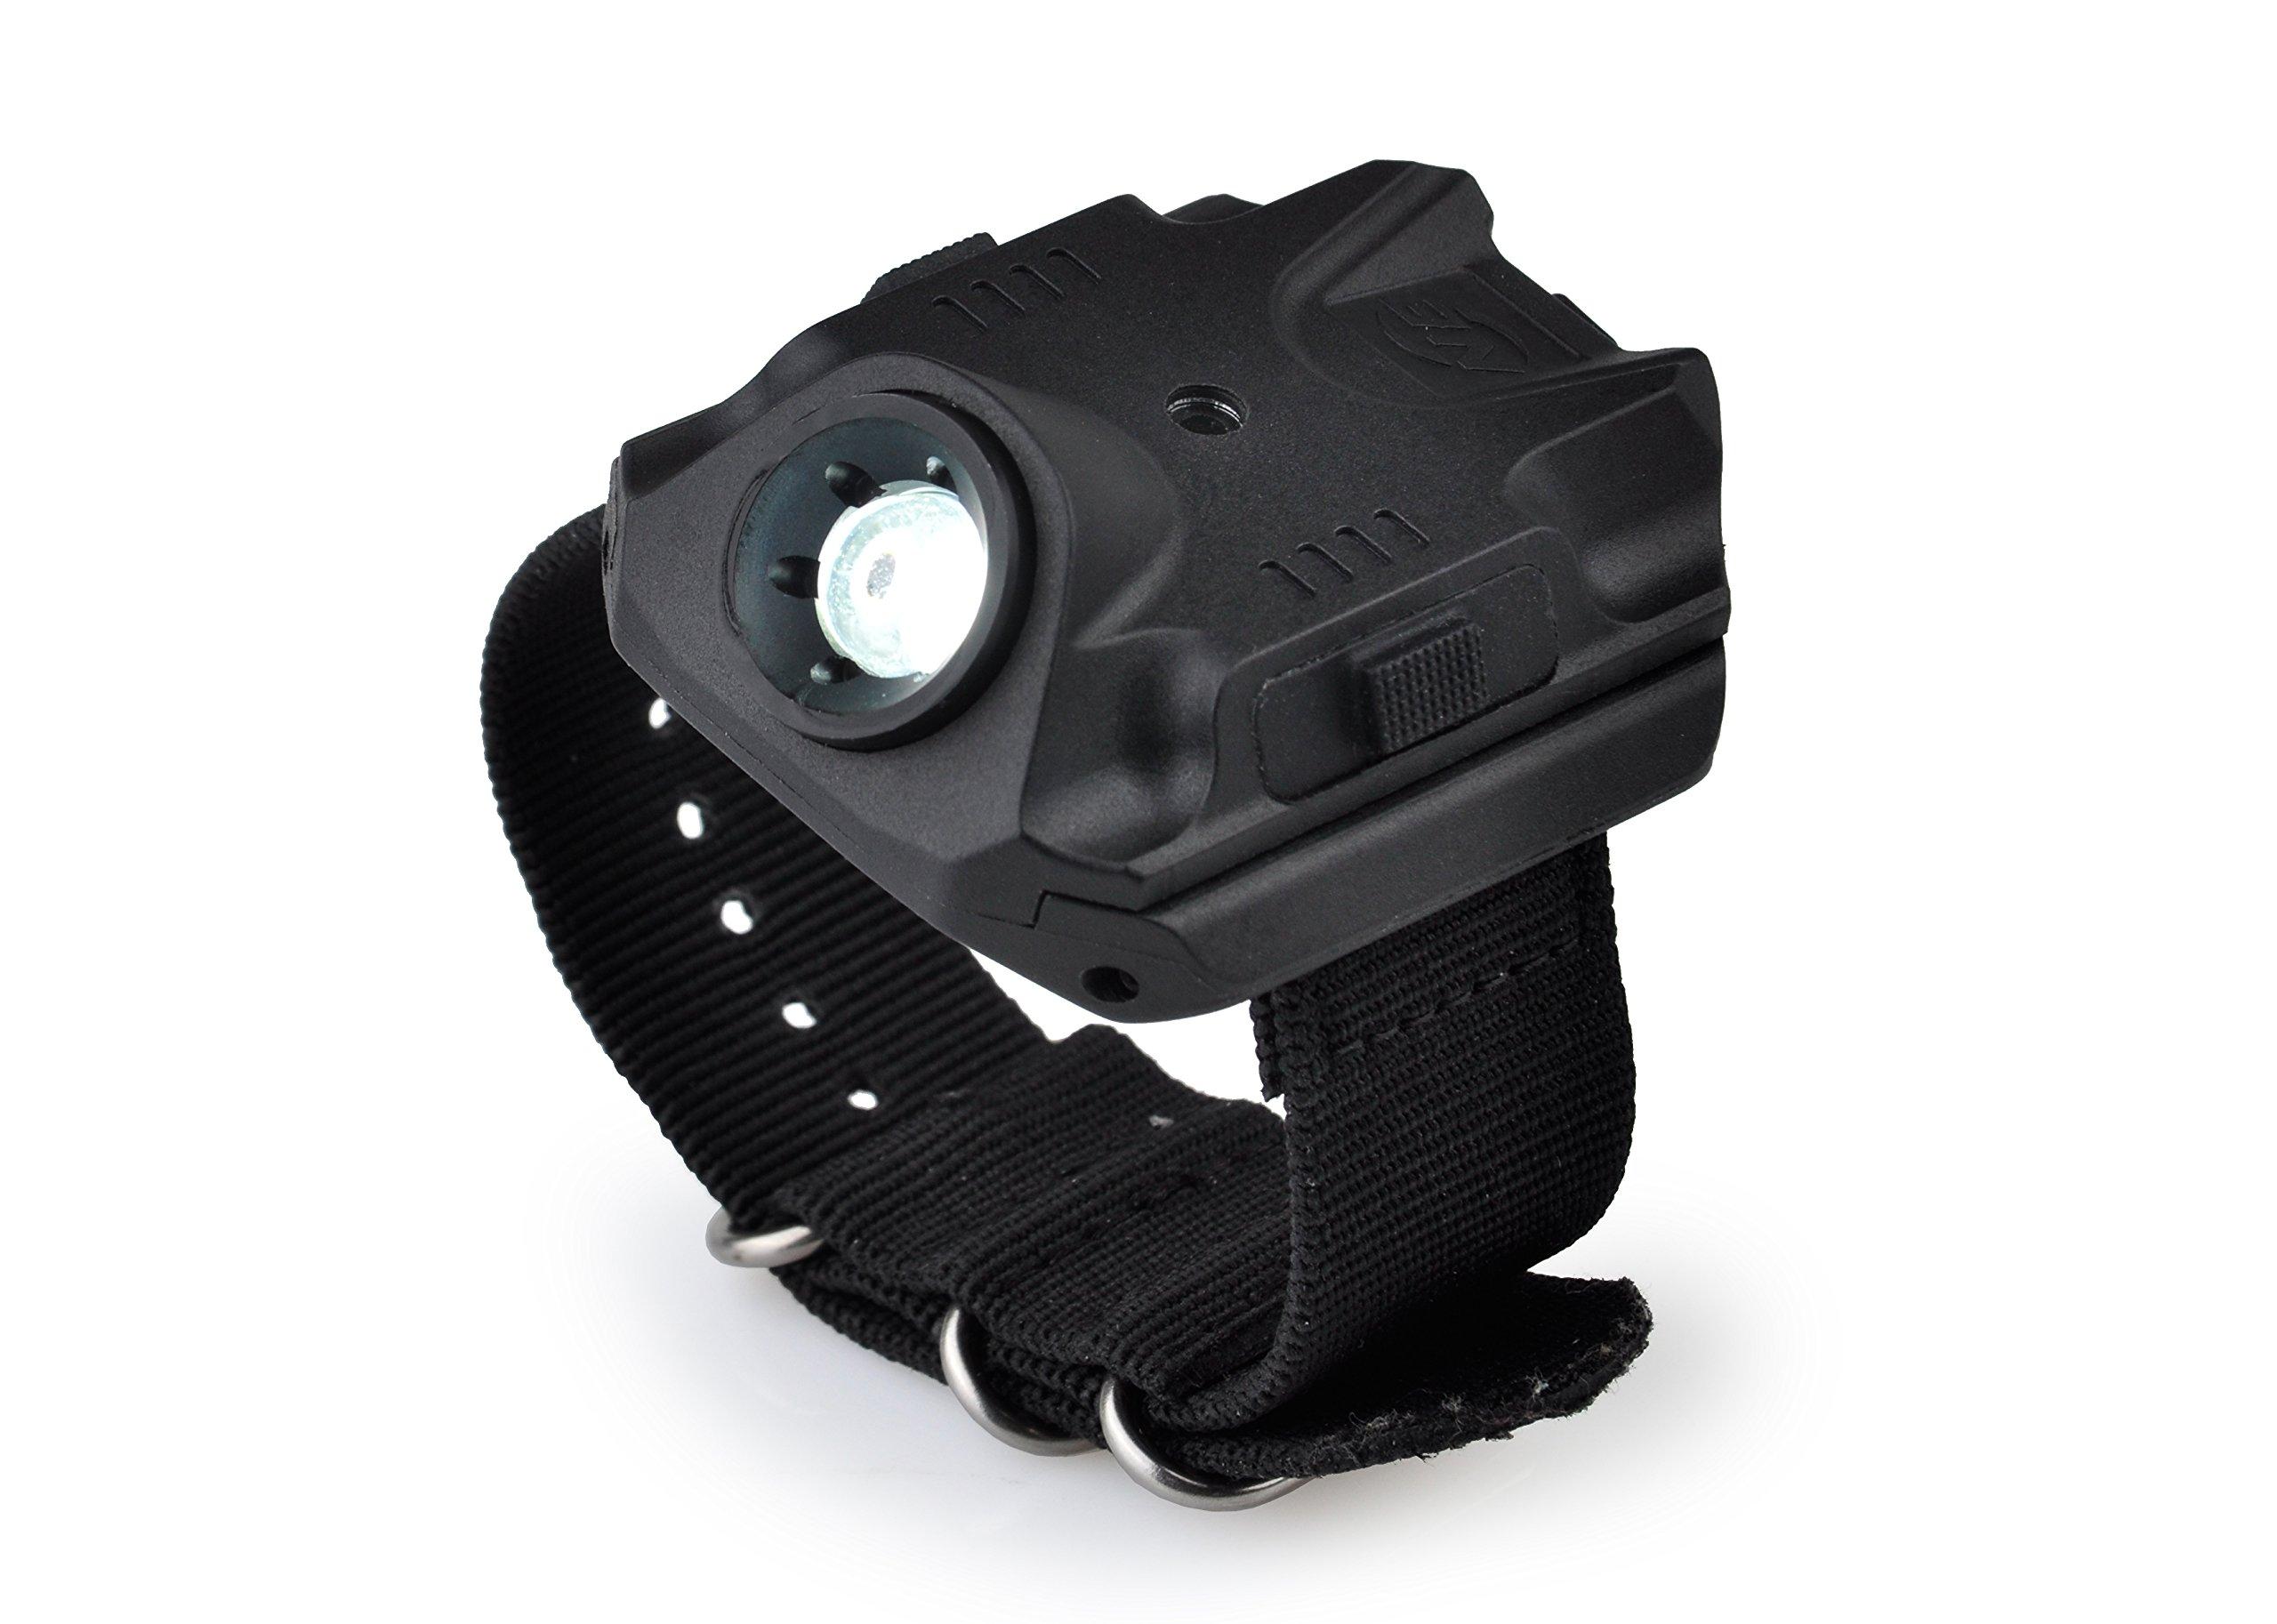 2211 WRISTLIGHTS Dummy Multifunction Tactical Mount Holder Clamp For Bike NE09001-BK